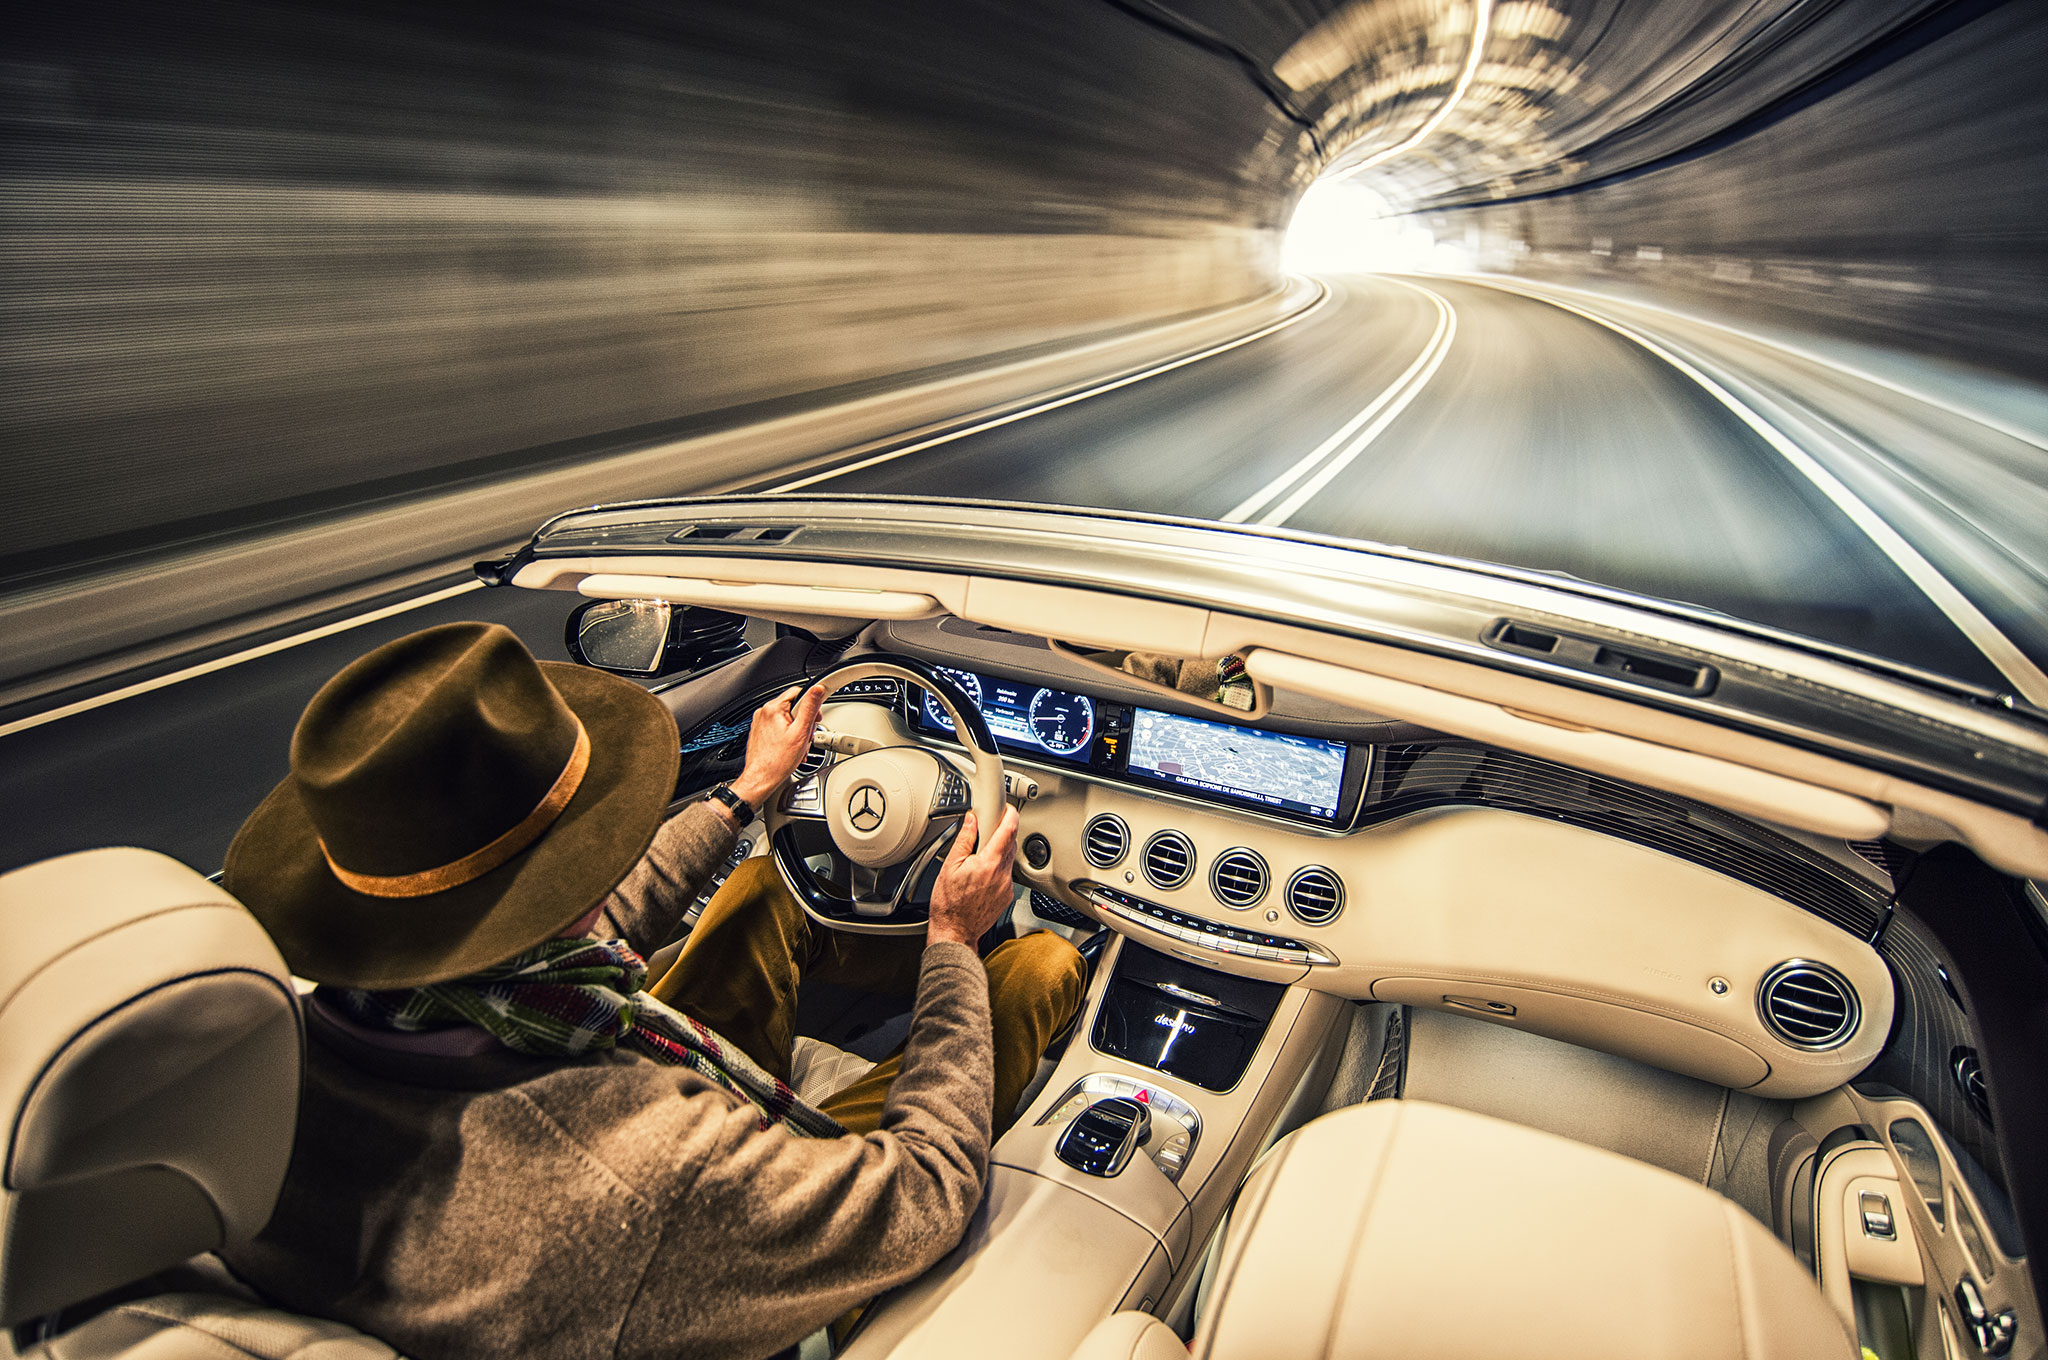 2017 Mercedes Benz S500 Cabriolet Review